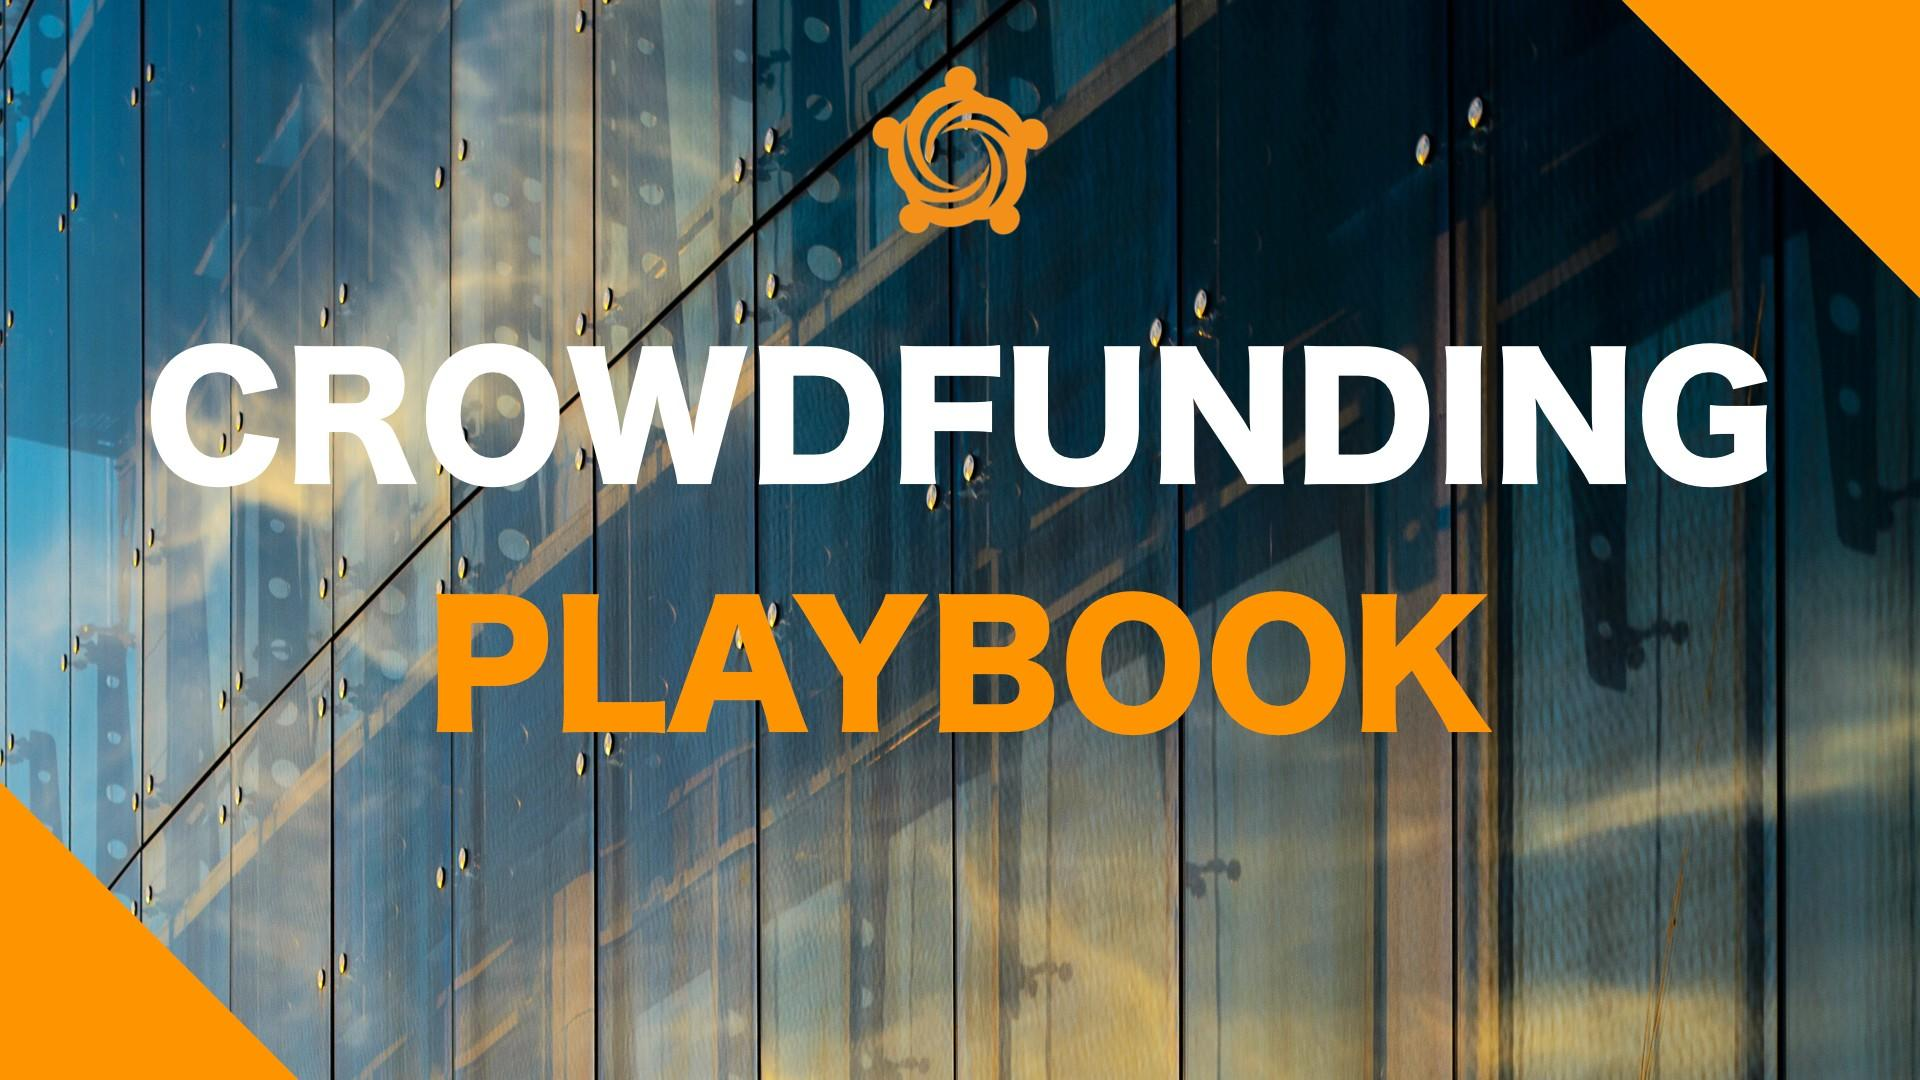 Crowdfunding Playbook Logo